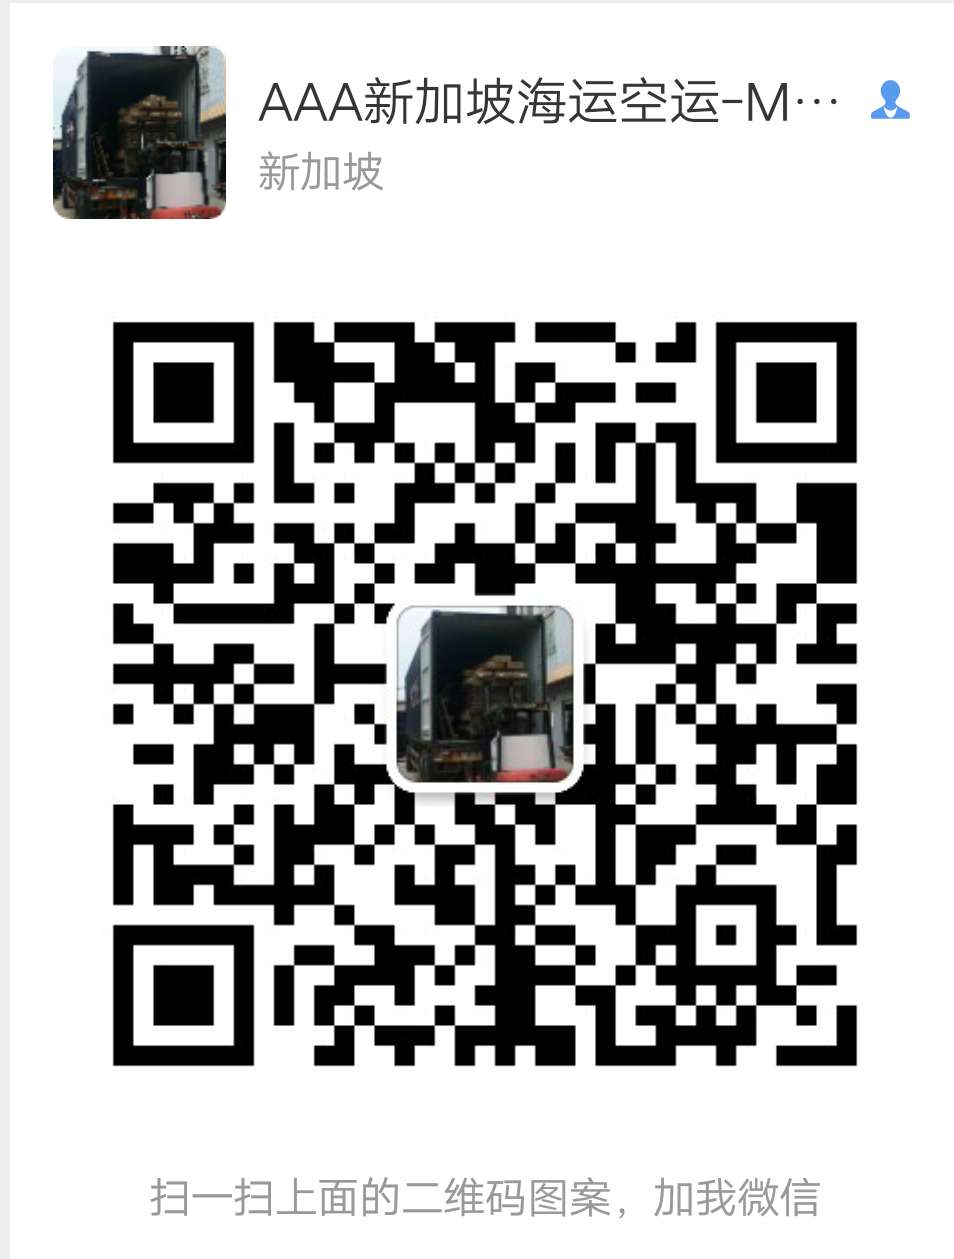 133c9138d54efed5a43a993a8573464.jpg